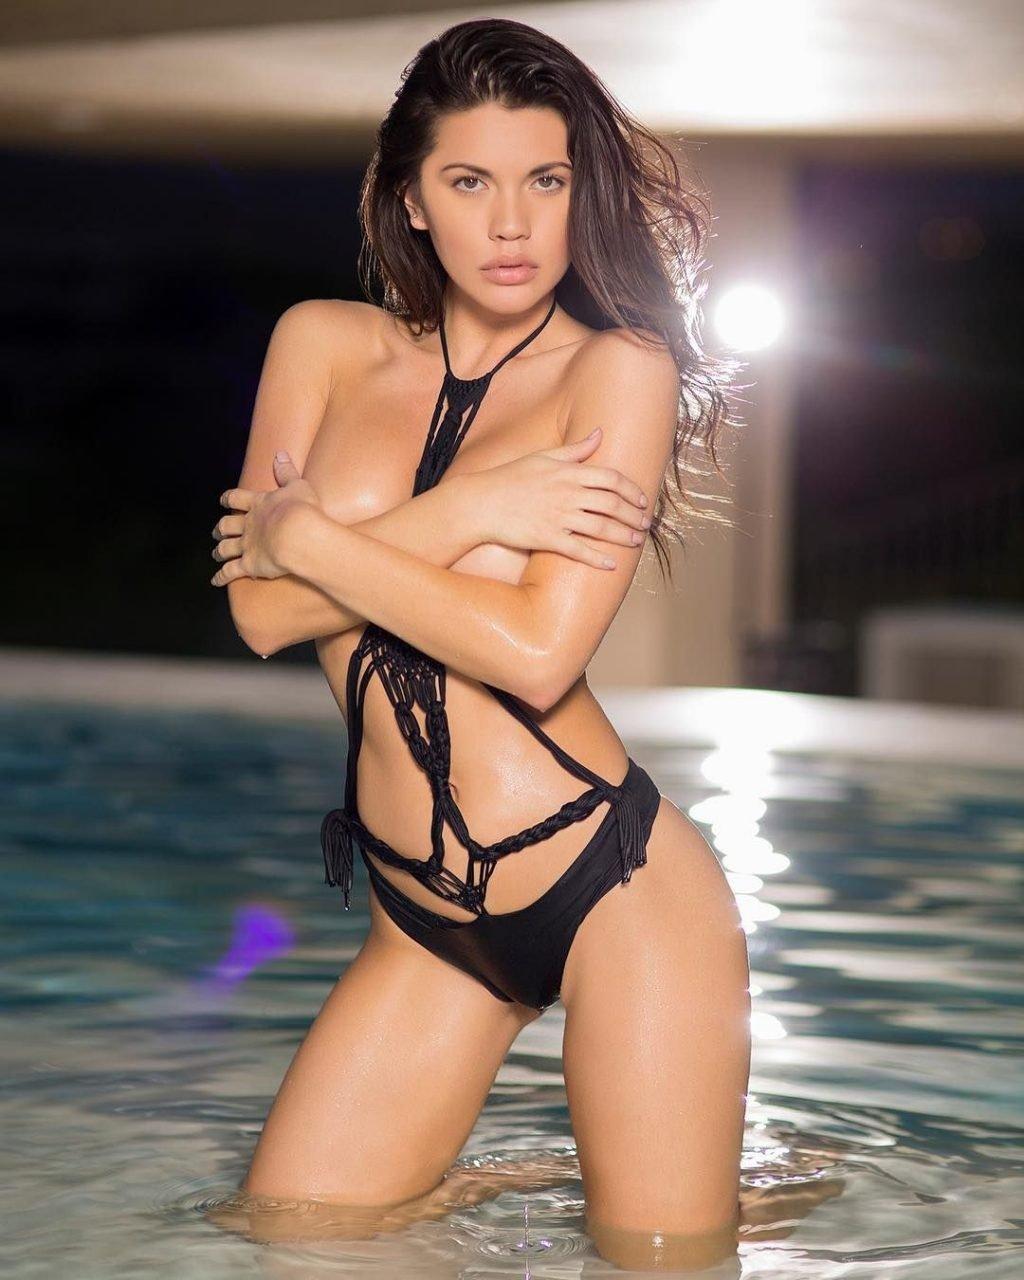 Michael jordan gets sexy bikini dance